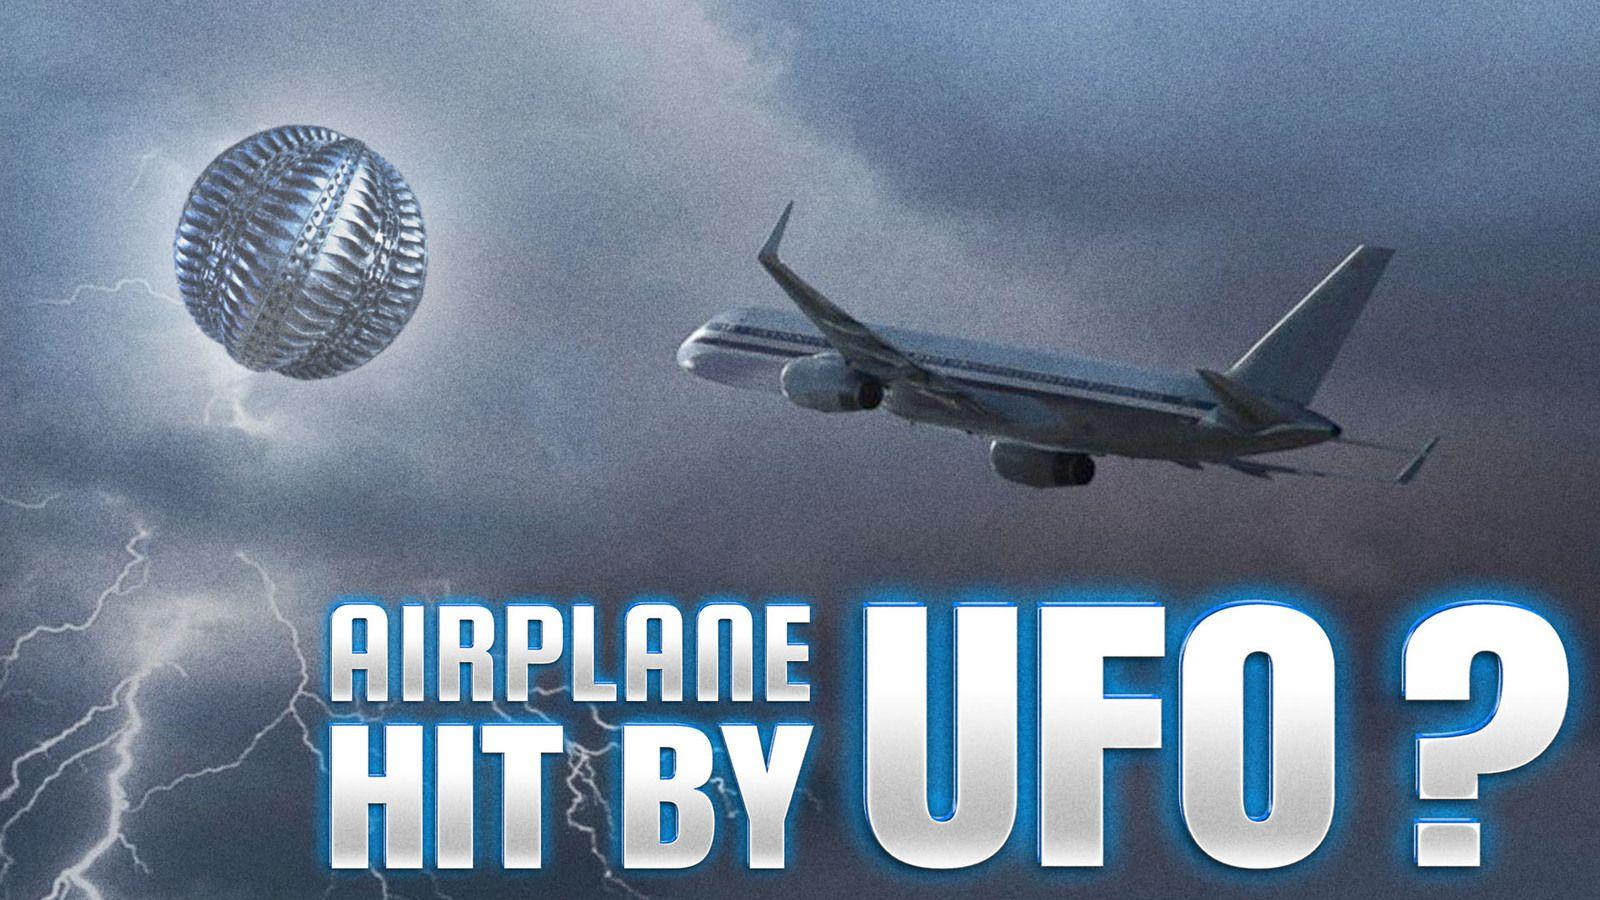 UFO SIGHTING NEWS : NBA Stars' Plane Hit by a UFO in 2017 👽